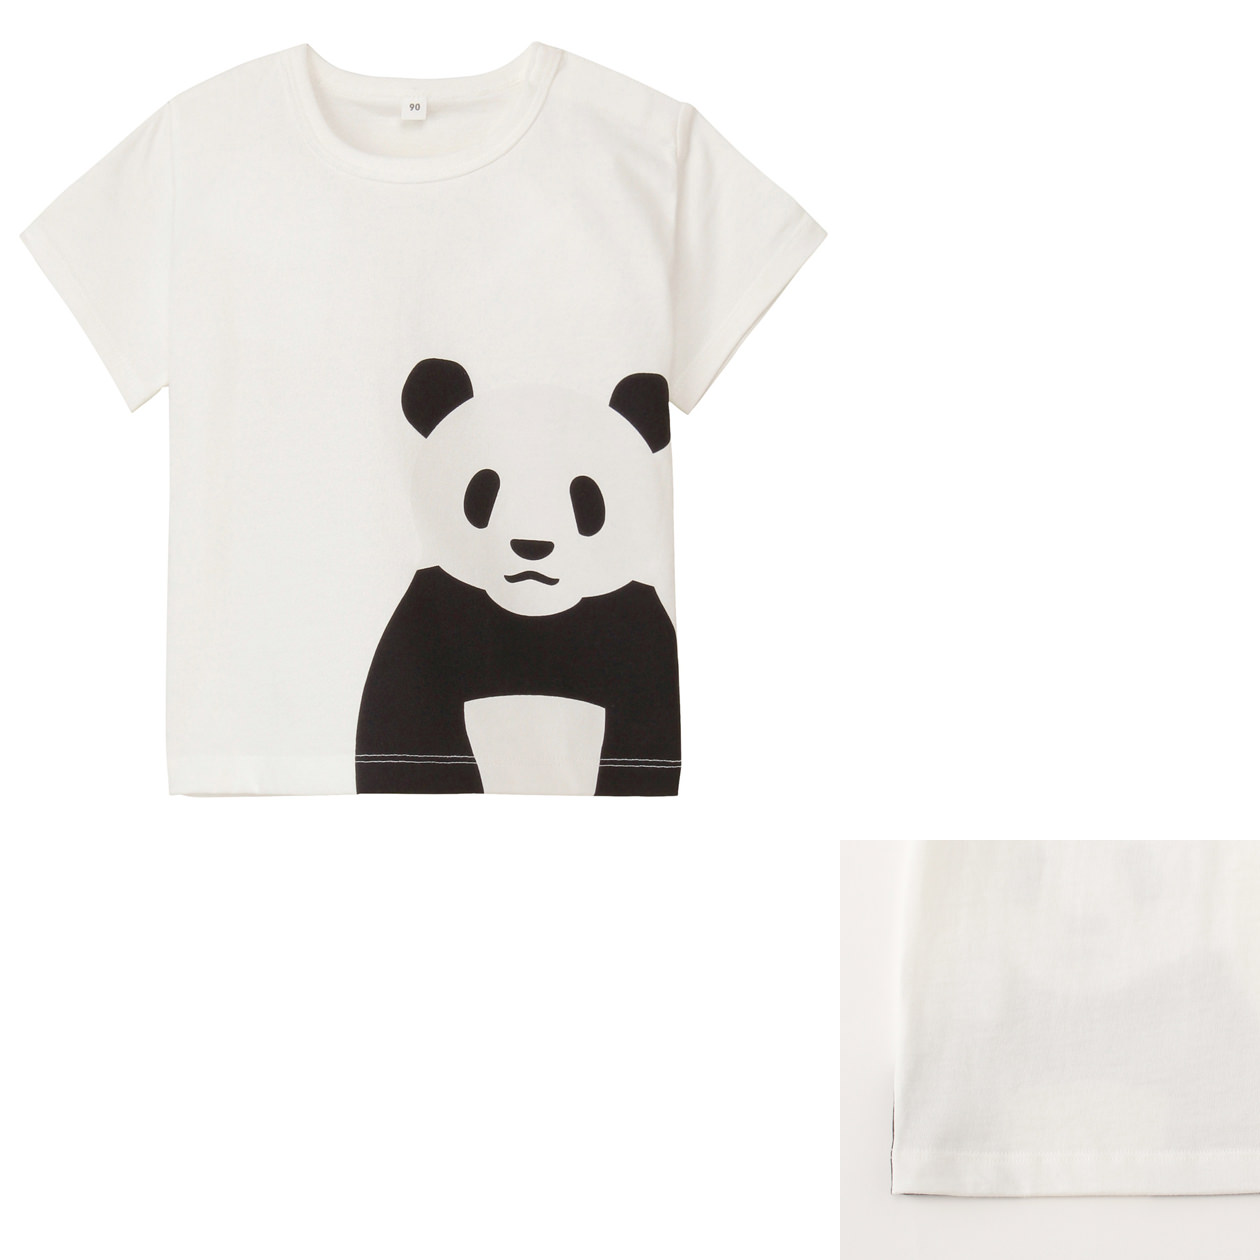 Organic cotton printed t shirt baby 100 giant panda muji for Sustainable t shirt printing